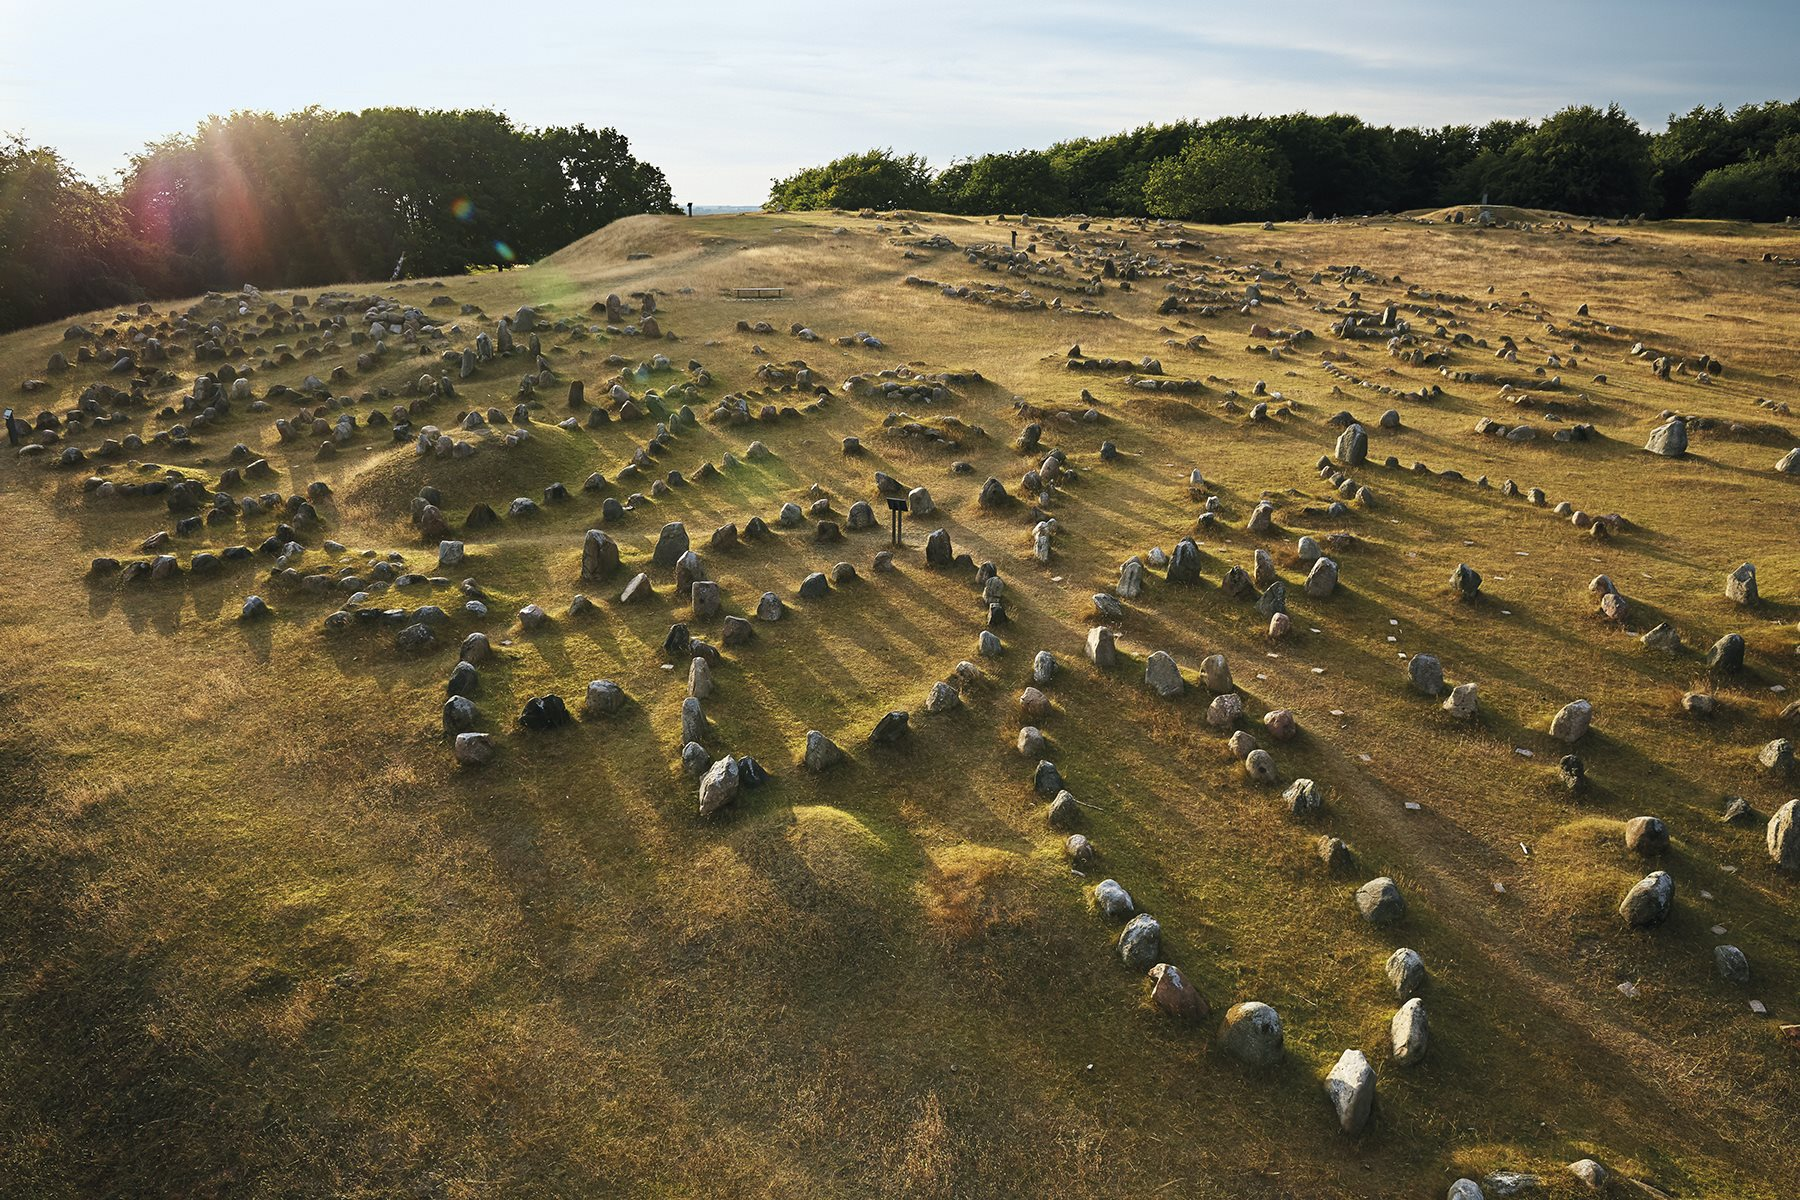 Necrópolis salpicada de piedras alineadas de tal modo que representan cascos de barcos